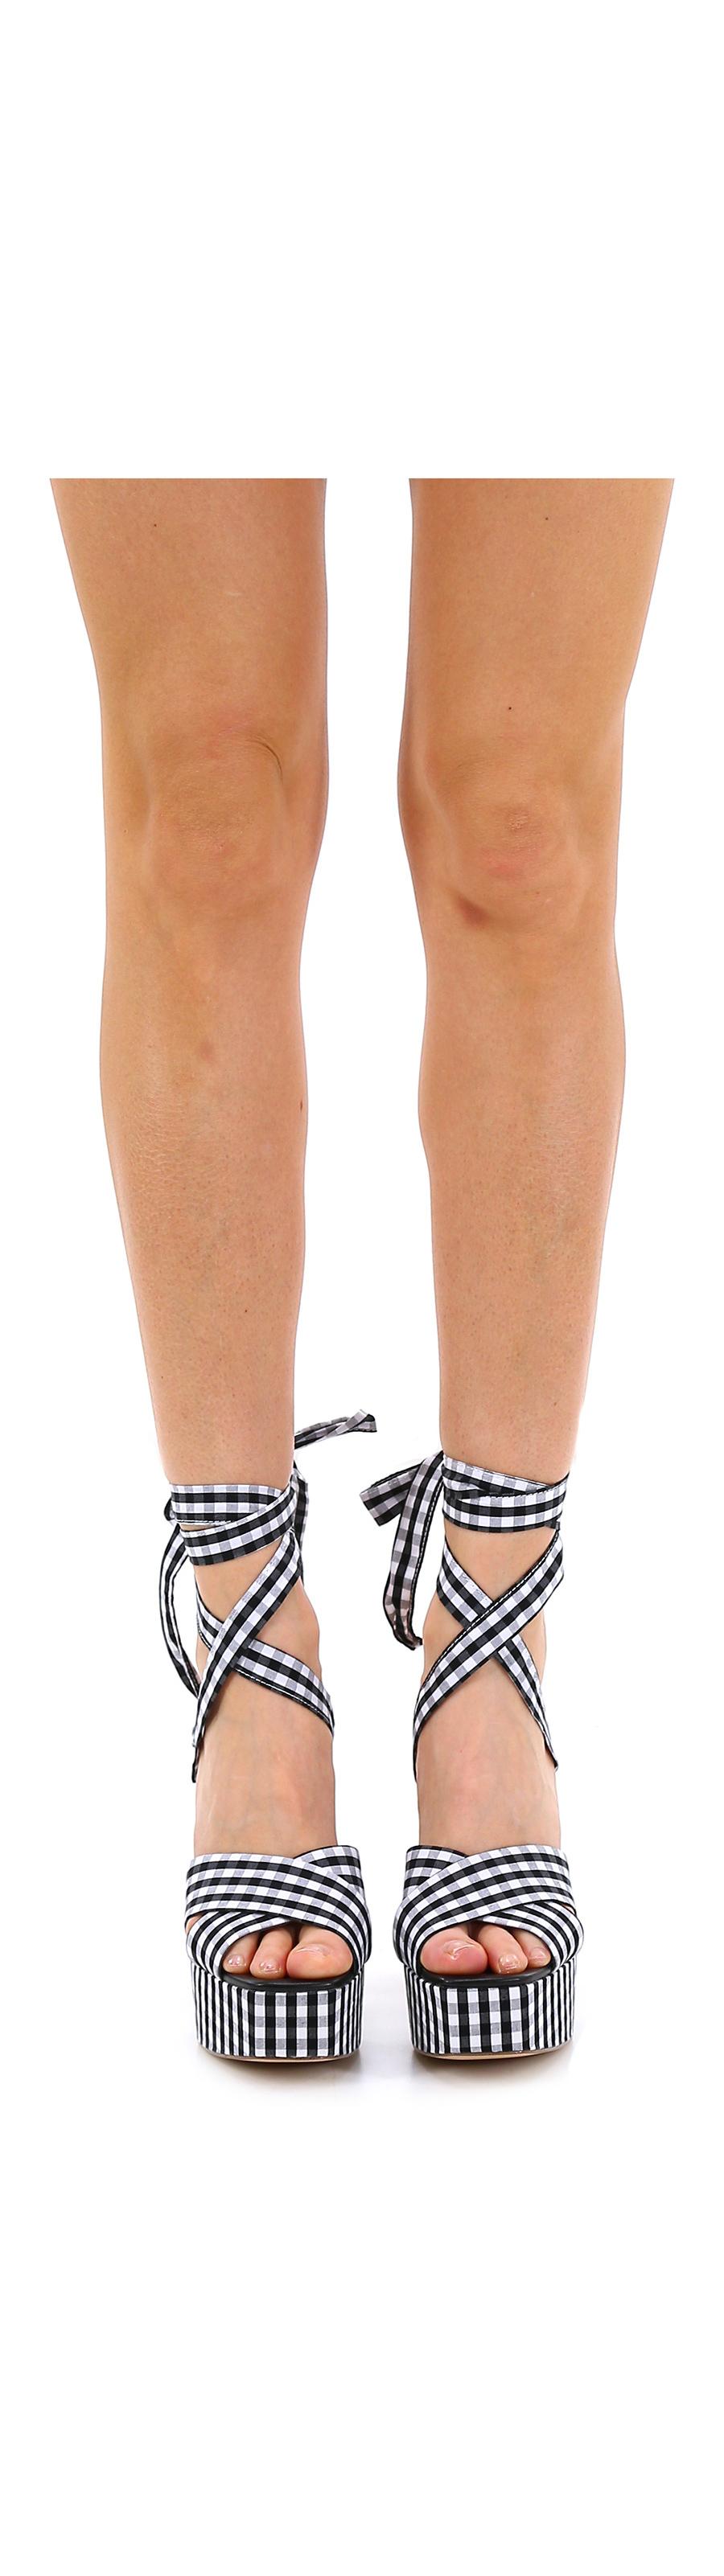 Sandalo alto  Twinset Bianco/nero Twinset  My Twin a7d6ba